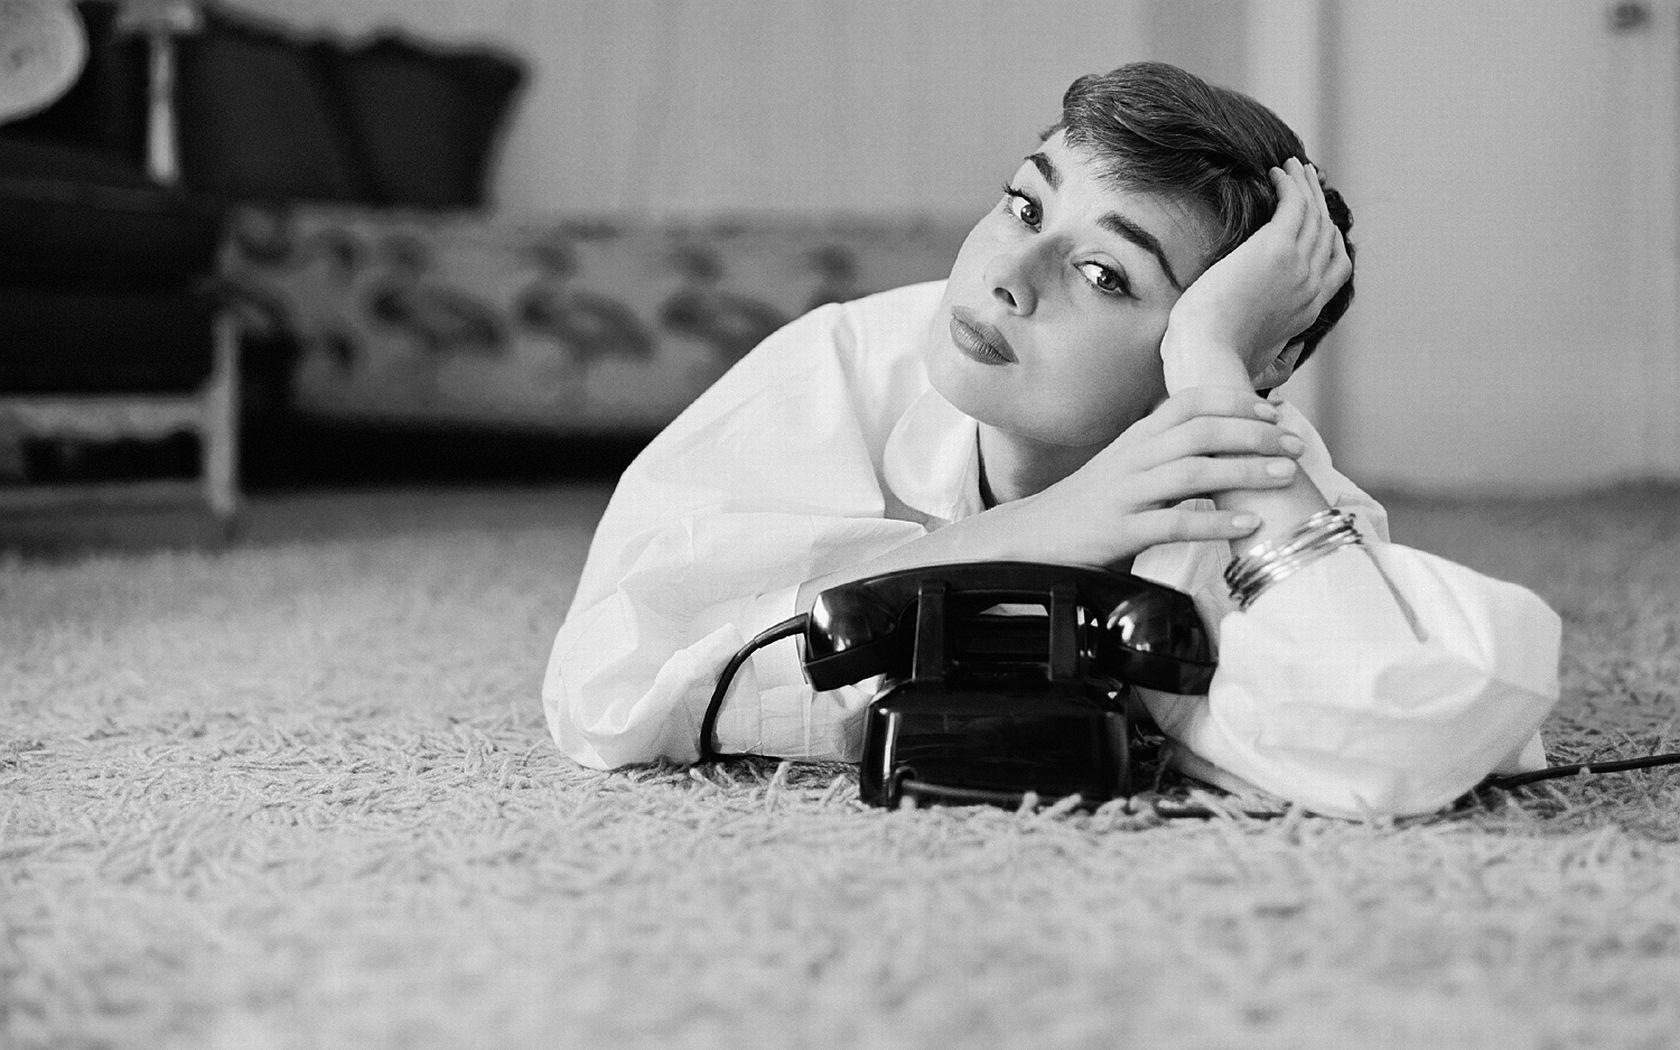 Audrey Hepburn Wallpaper Celebrity And Movie Pictures Photos Wallpaper Audrey Hepburn Photos Audrey Hepburn Audrey Hepburn Wallpaper